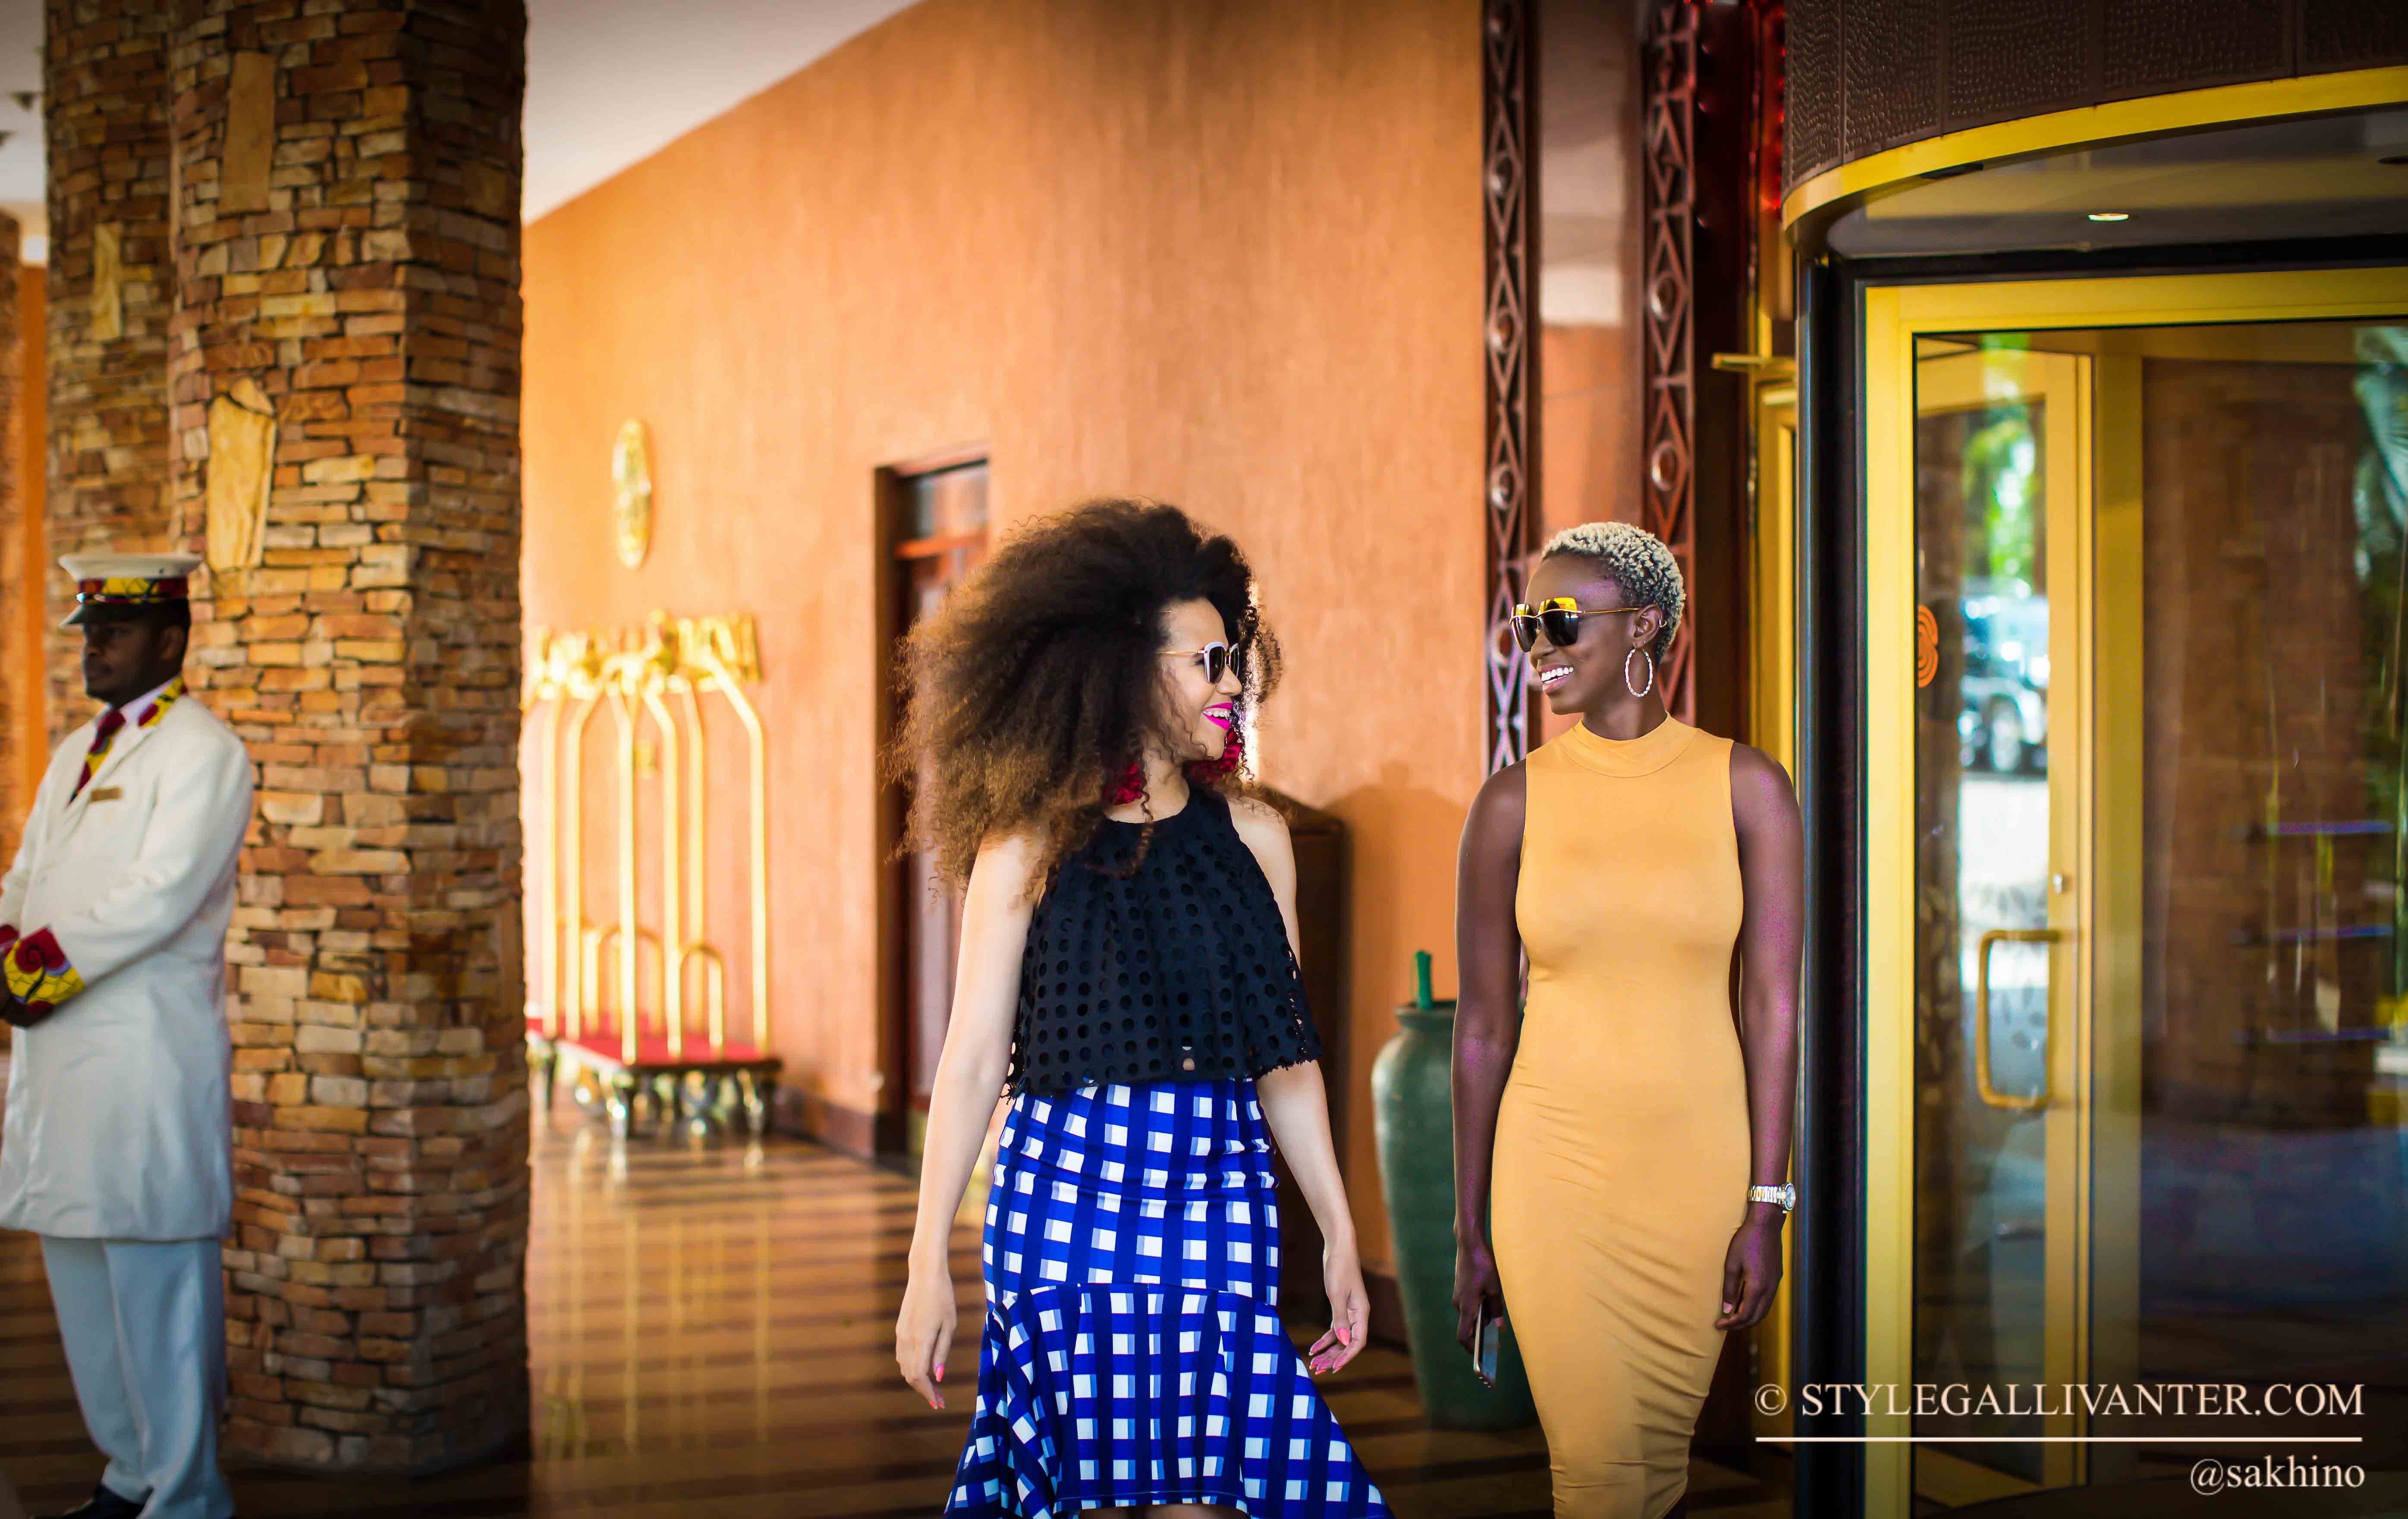 copyright-stylegallivanter.com_top-african-models_top-natural-hair-bloggers-2016_top-london-bloggers-2016_best-uk-fashion-blogs-2016-17